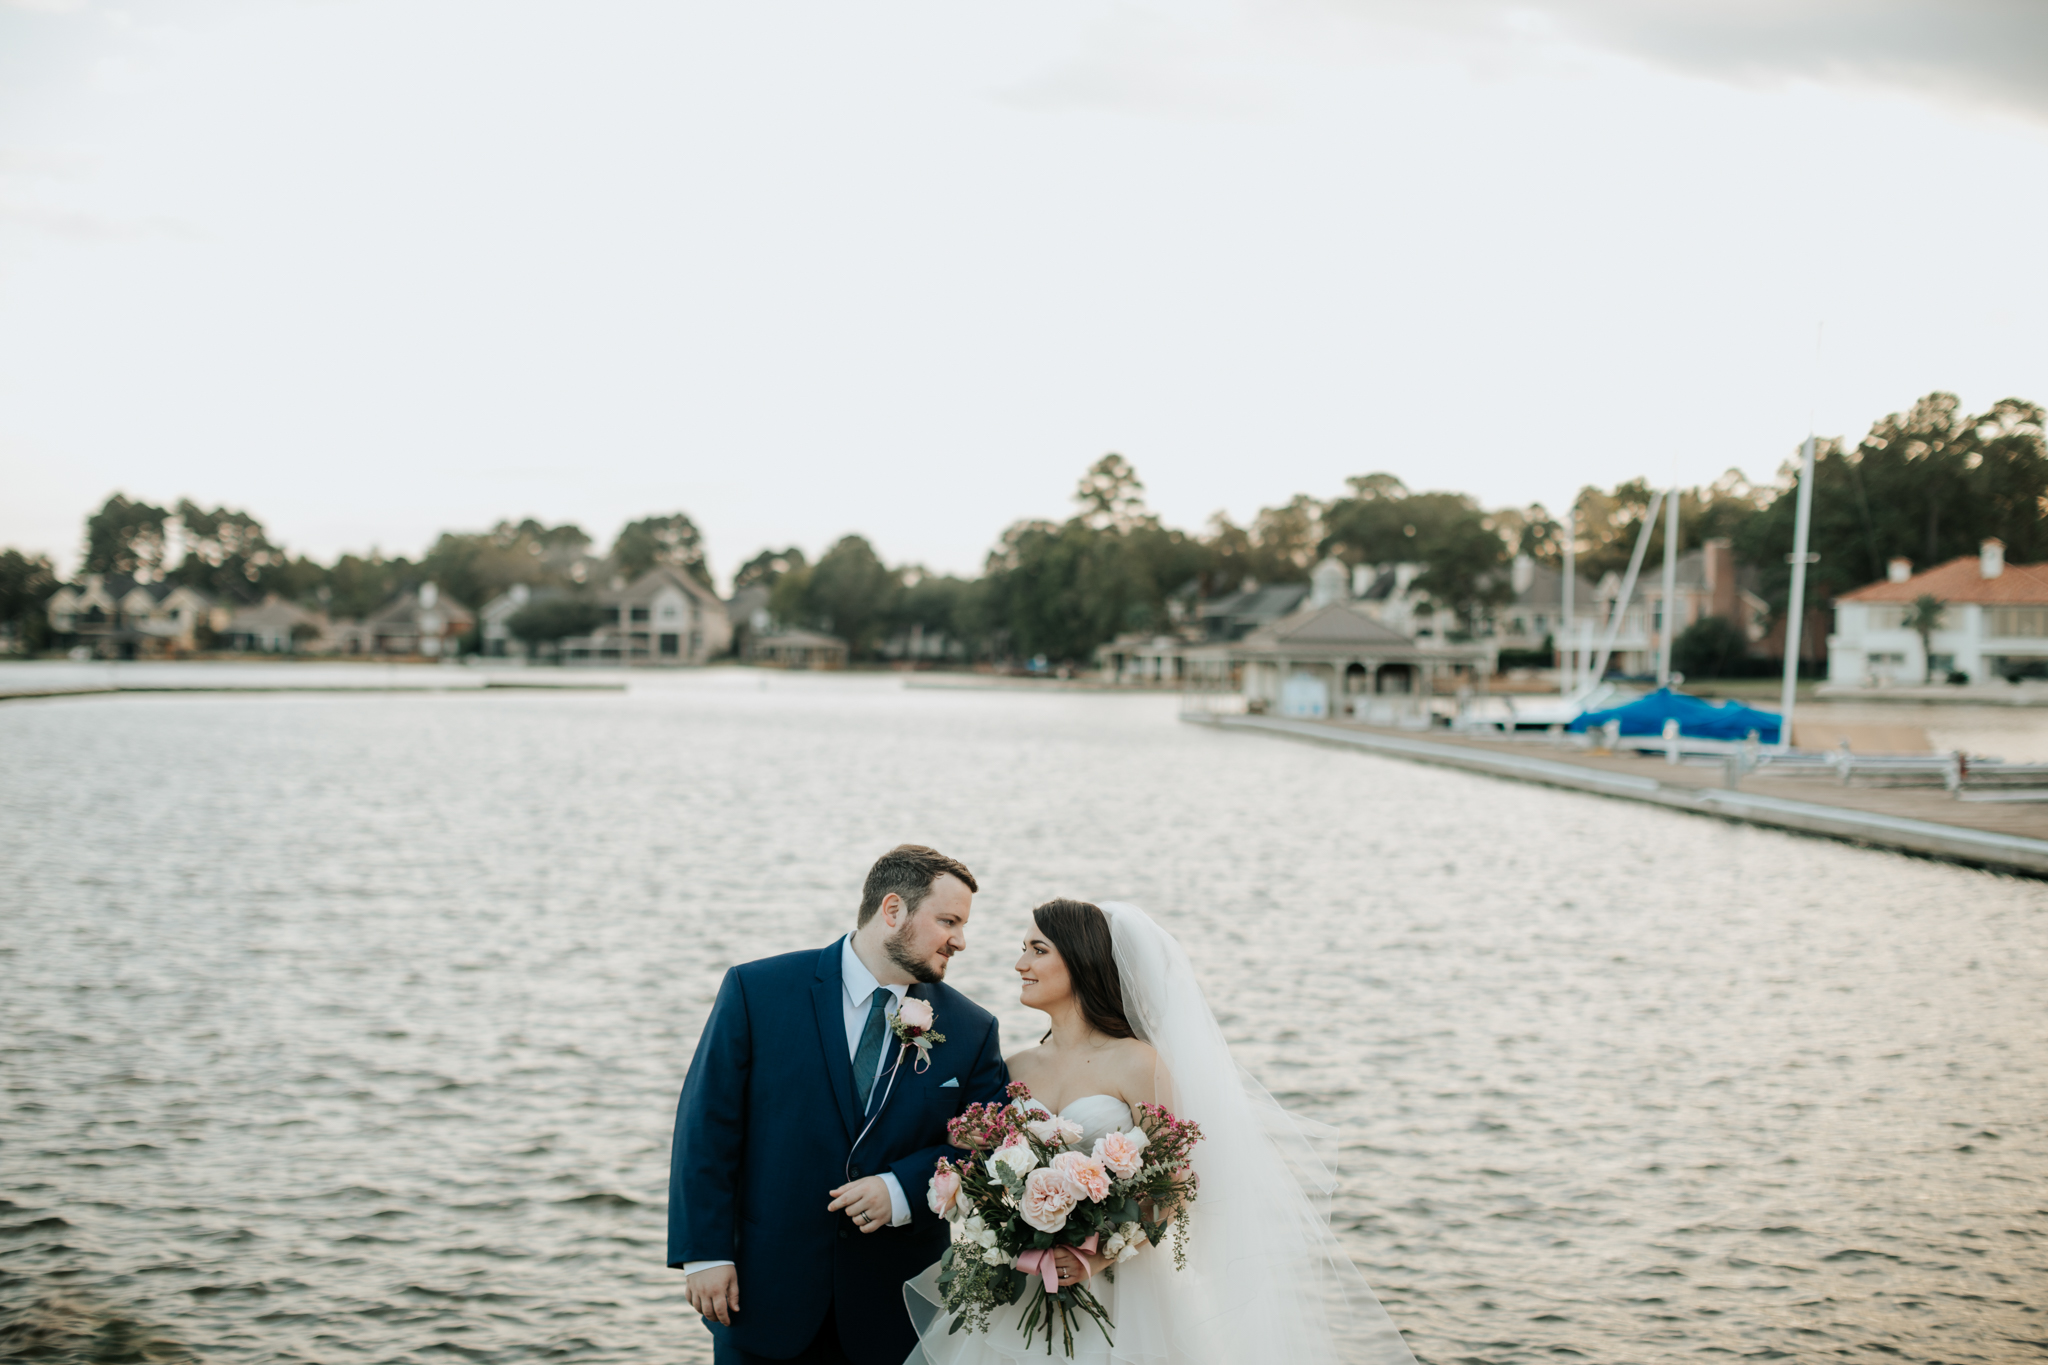 Leah Nicole Photography - Houston Wedding Photographer-Lake Conroe Wedding- Houston Wedding Photographer-40.jpg